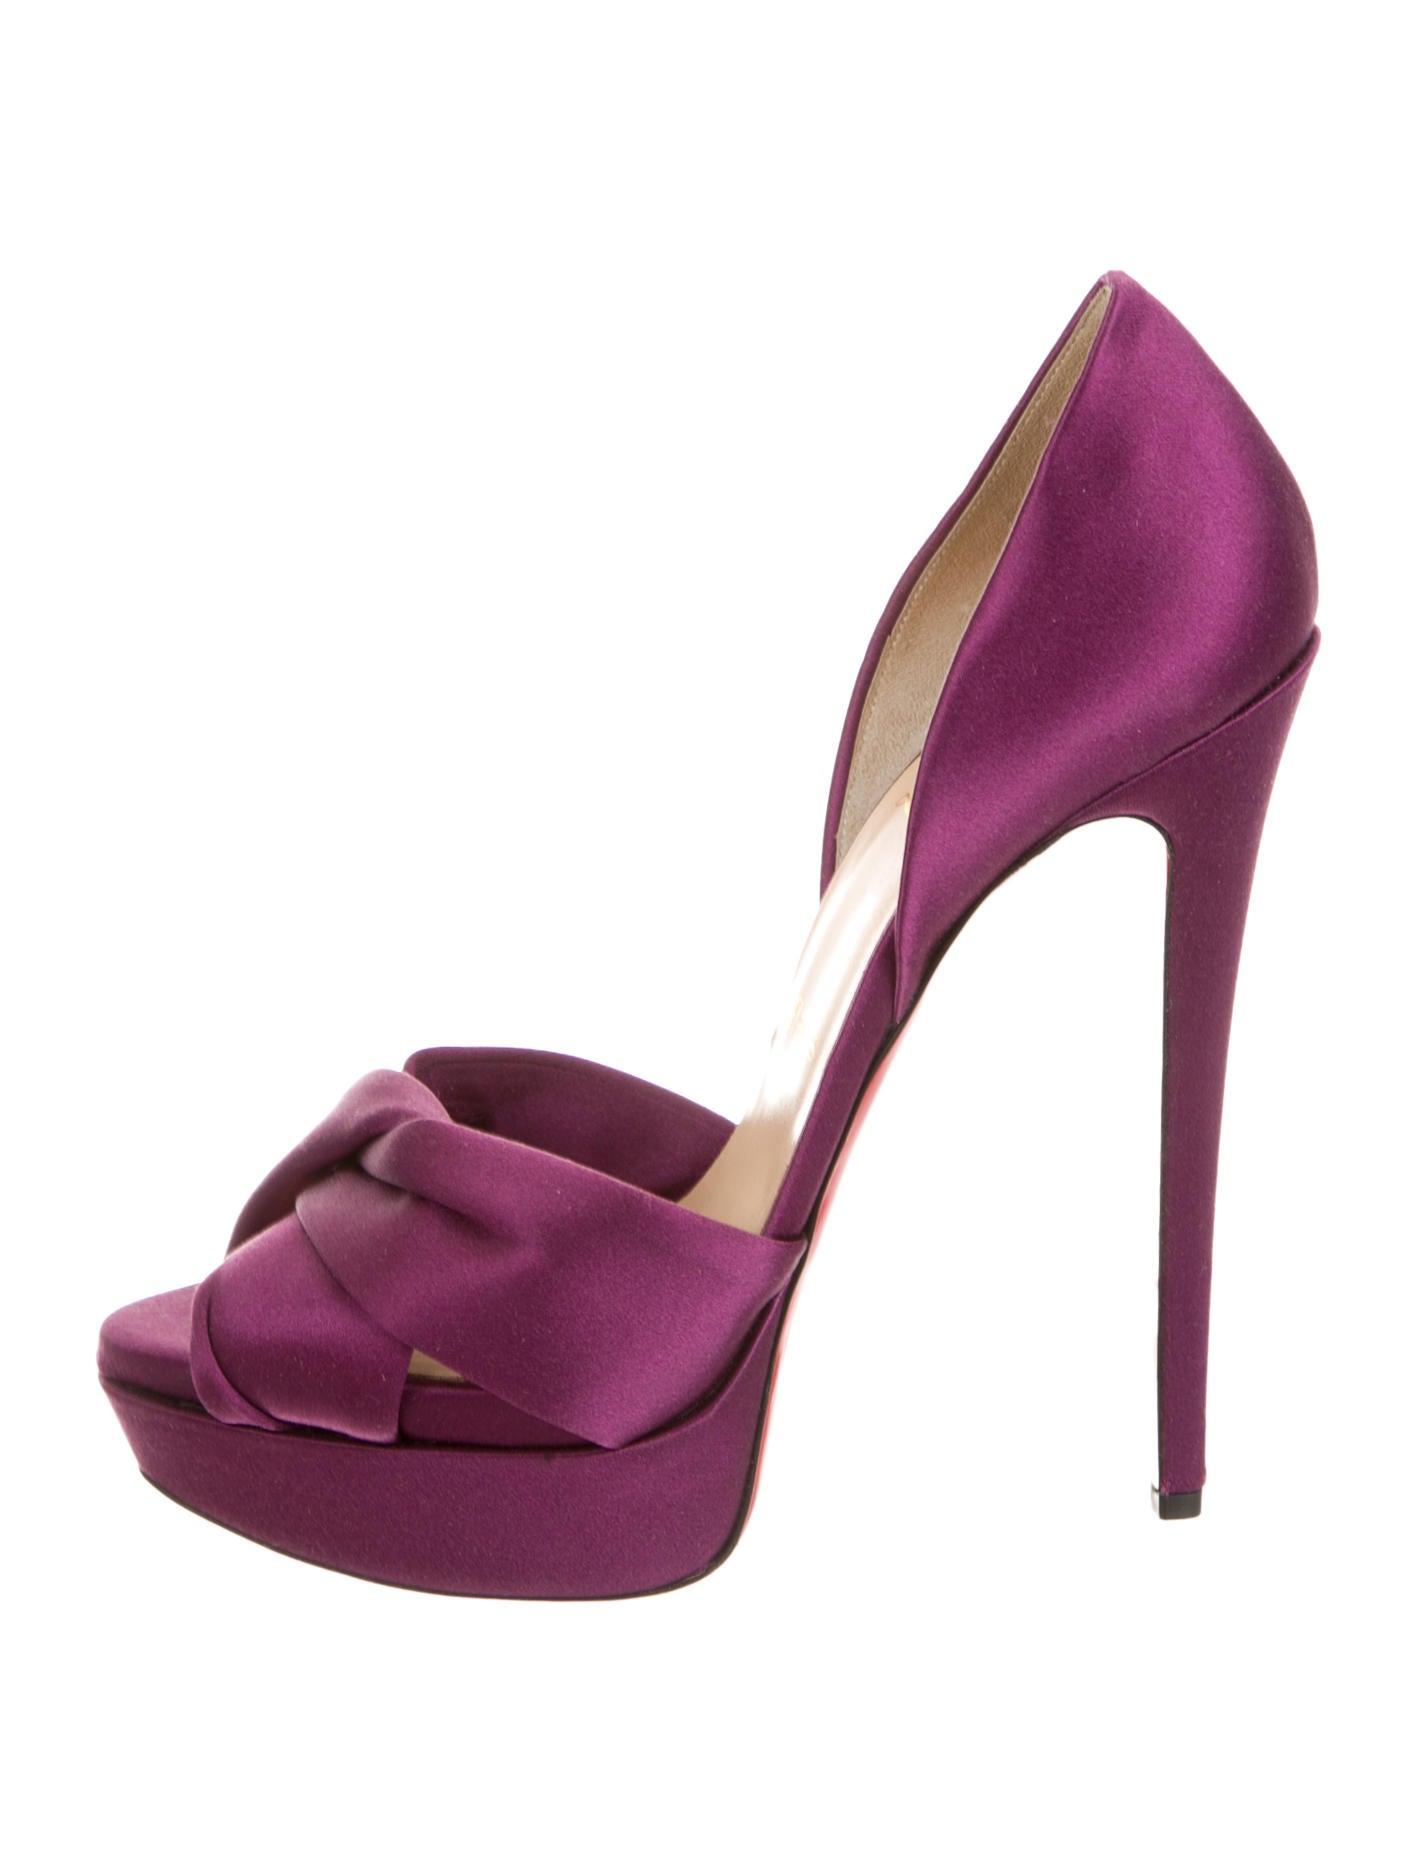 christian louboutin mens trainers - christian louboutin platform pumps Purple satin gathering accent ...